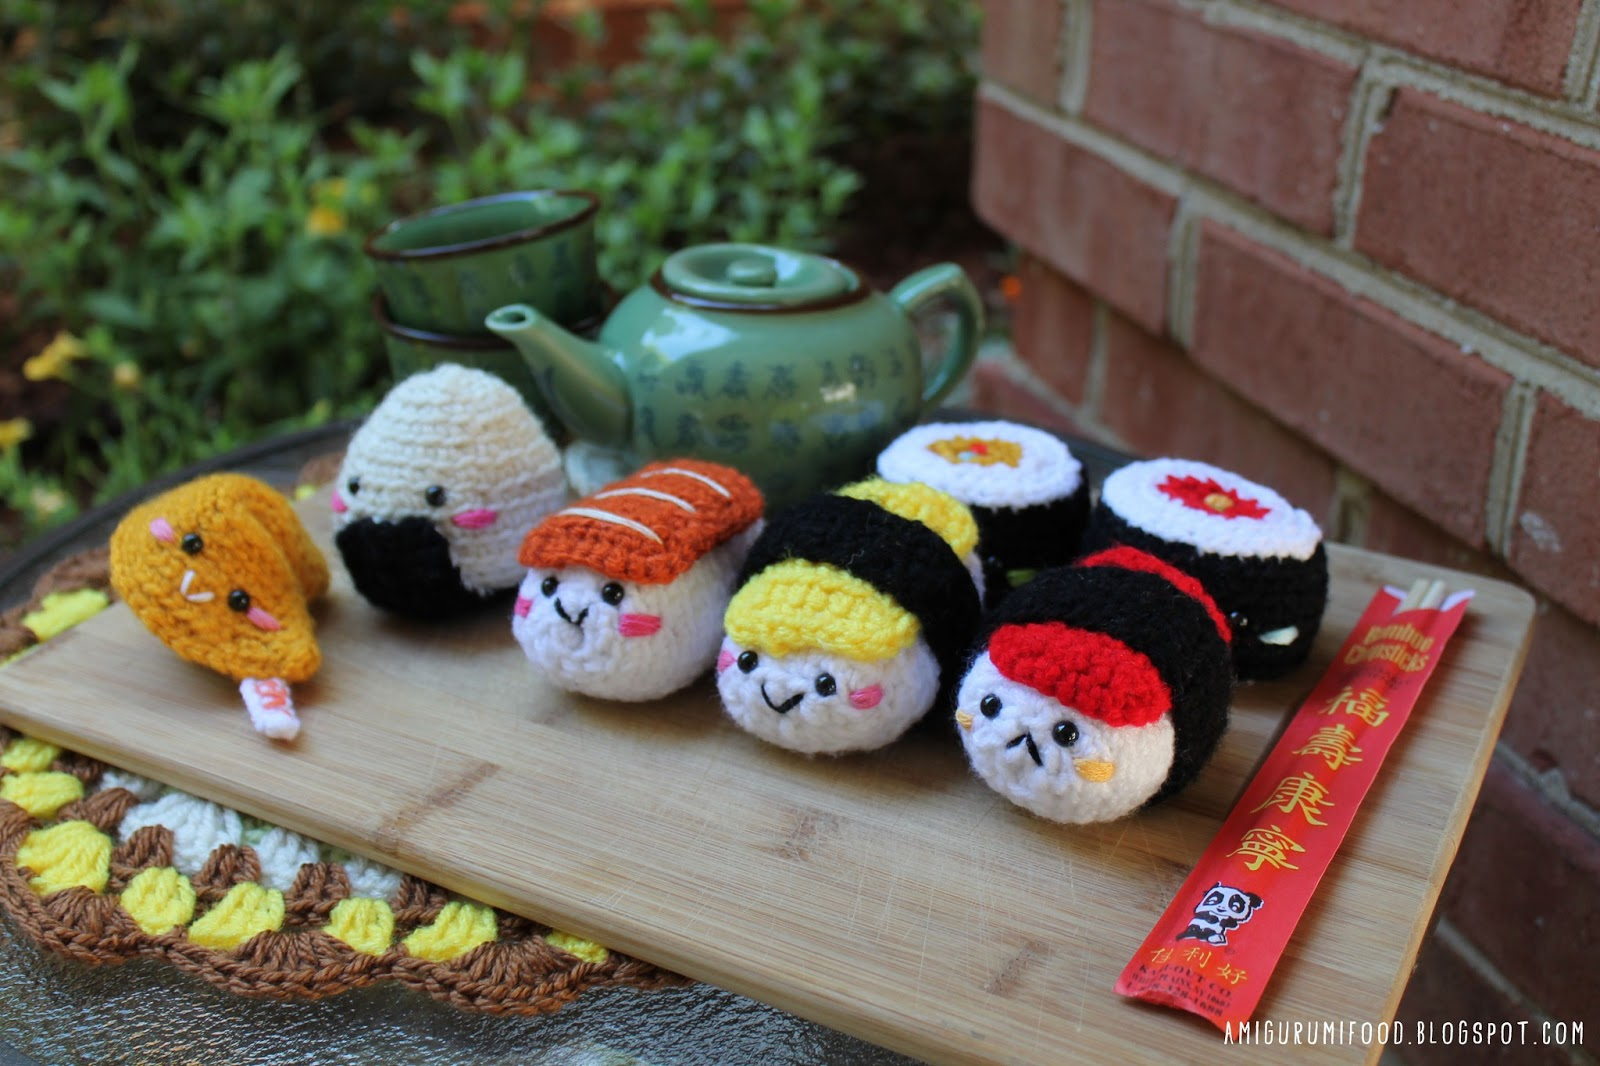 Bento family 2 Sushi set amigurumi pattern - Amigurumipatterns.net | 1066x1600